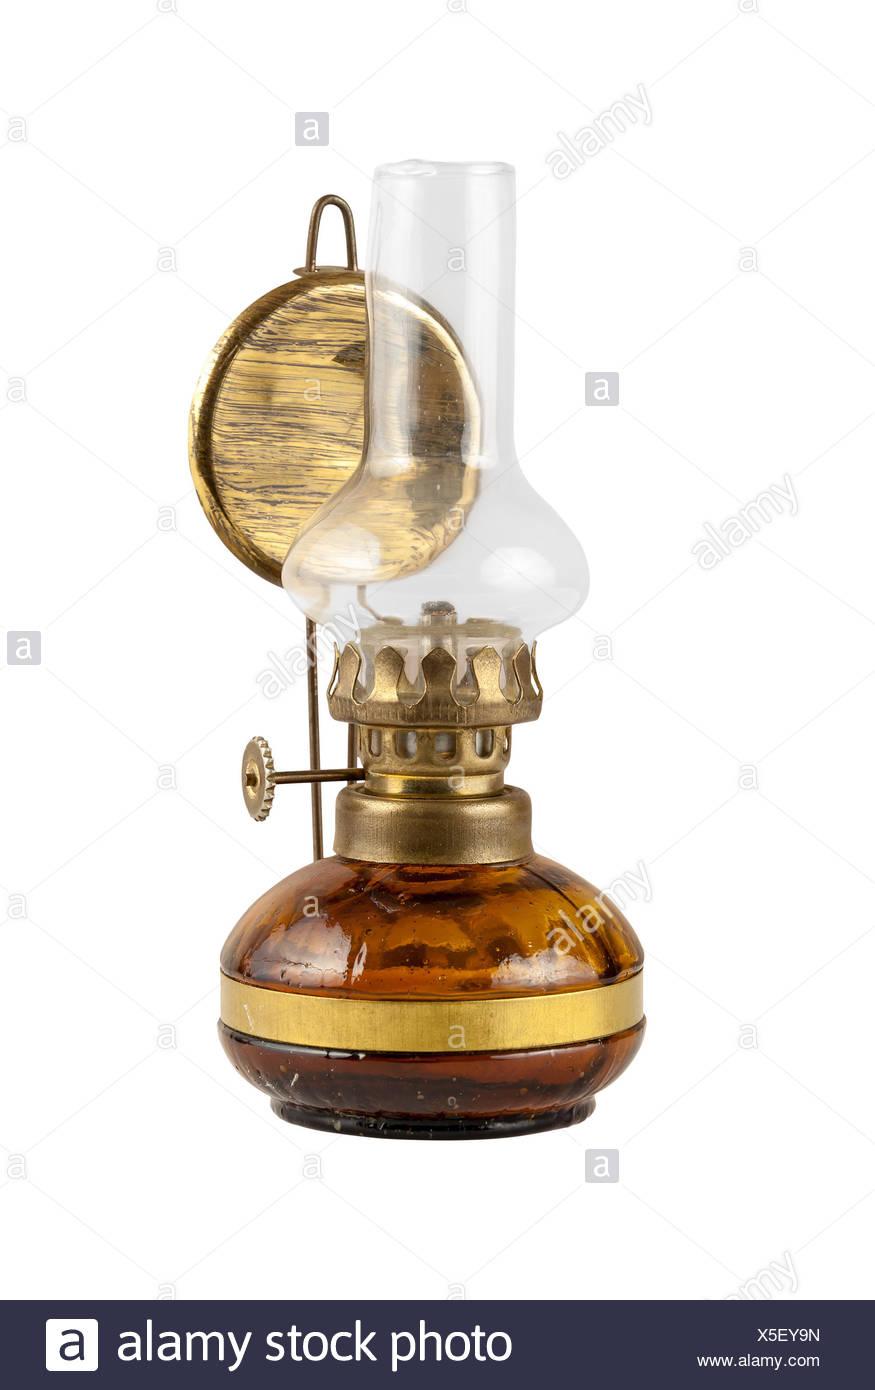 Old kerosene lamp isolated on white background with clipping path - Stock Image